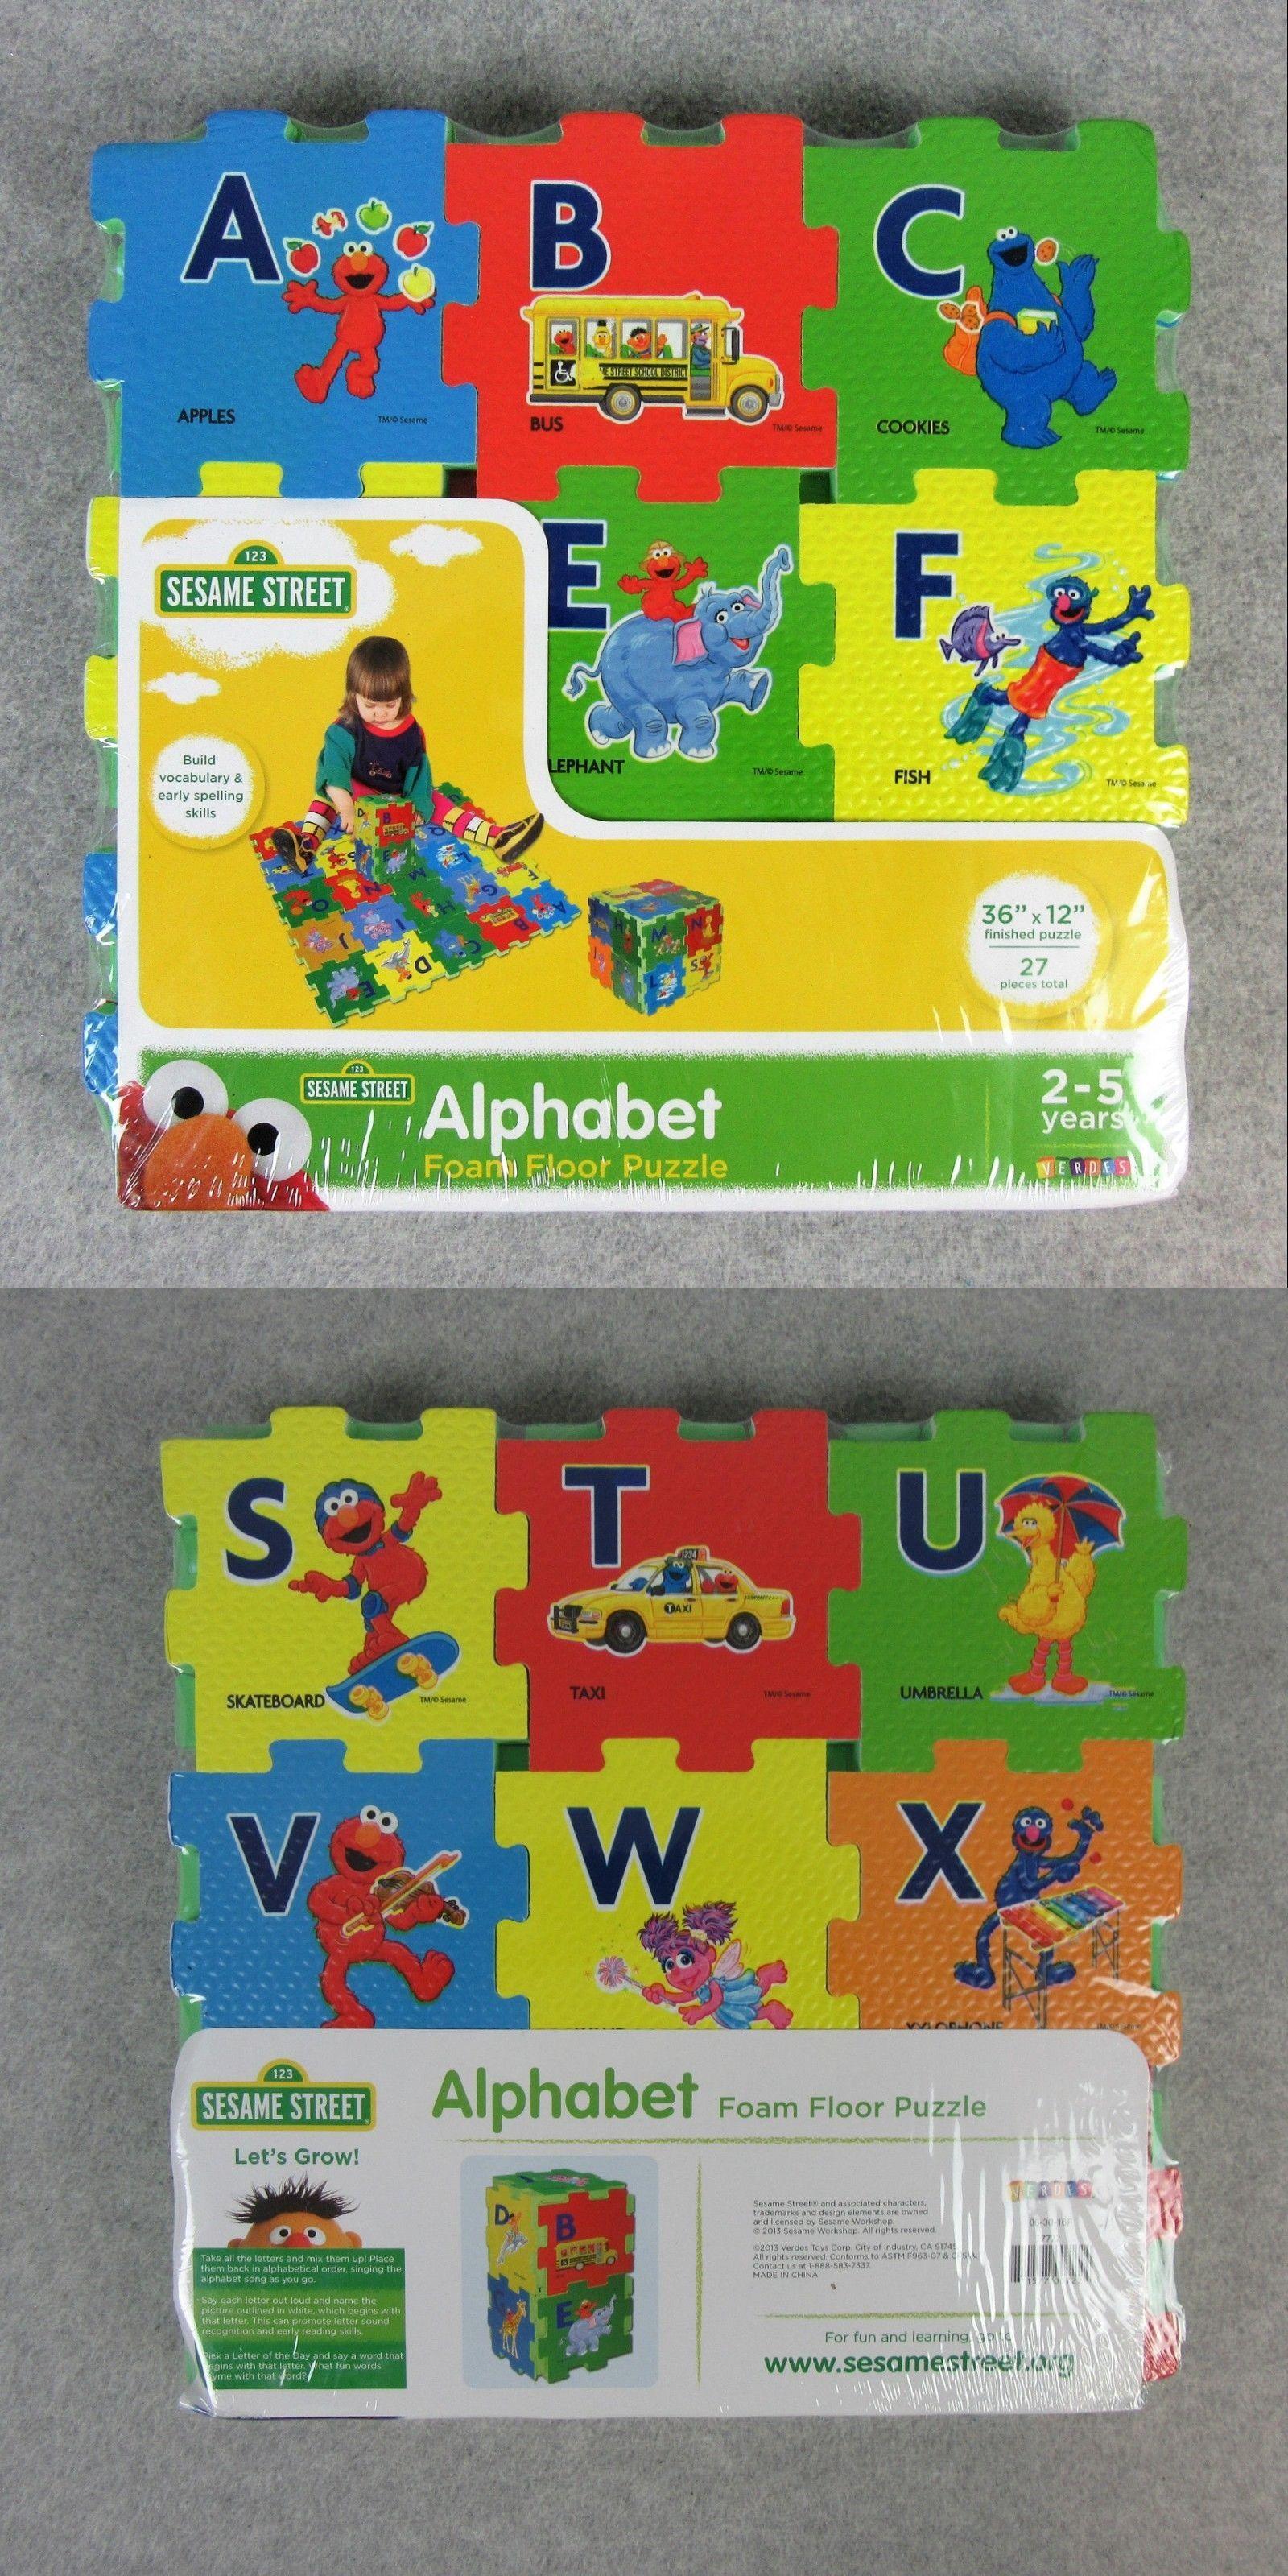 Blocks Tiles And Mats 145931 Sesame Street Alphabet Foam Floor 27 Pieces Puzzle 36 X12 Foam Mat New Buy It Now Only Foam Flooring Sesame Street Flooring